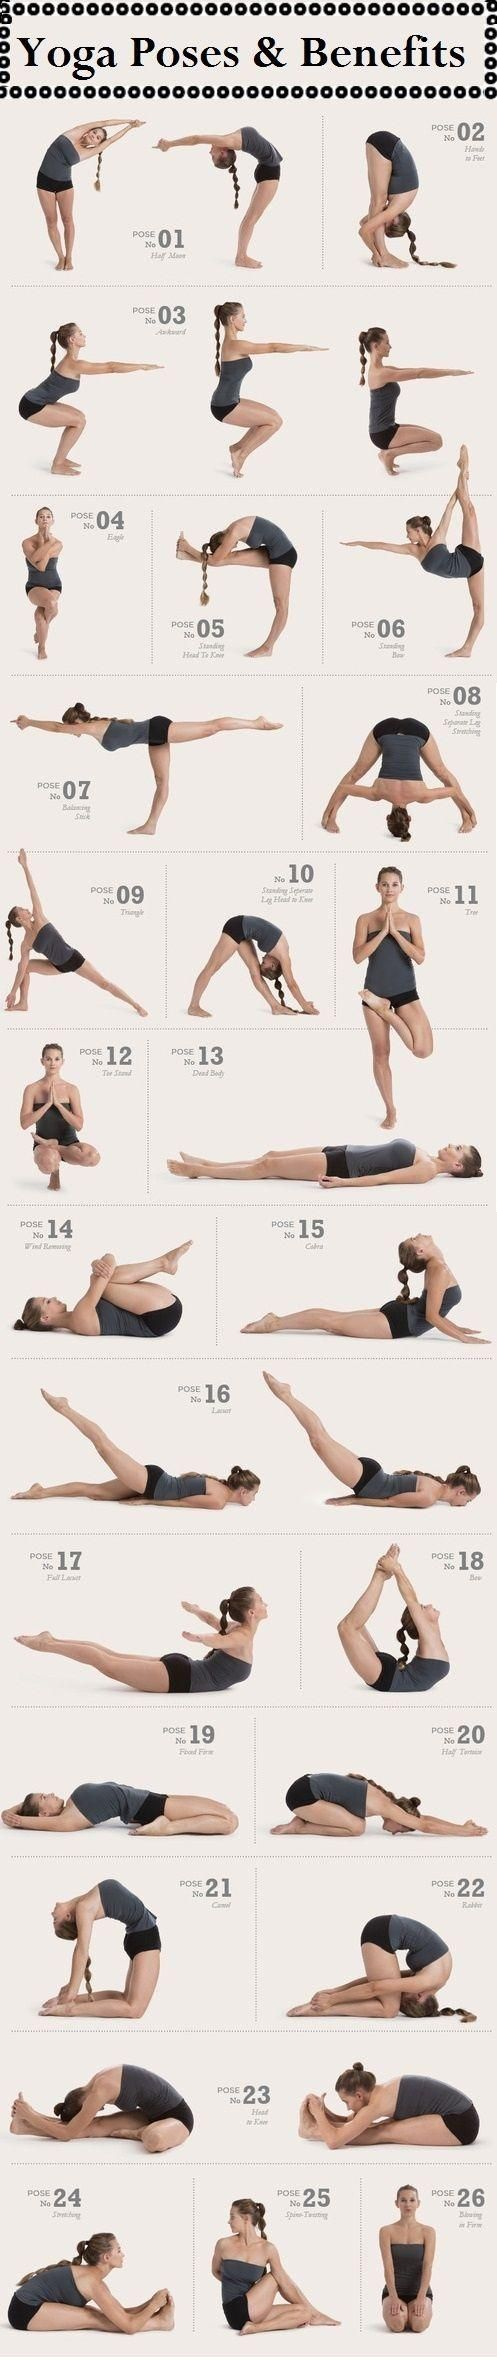 Yoga Poses and Benefits